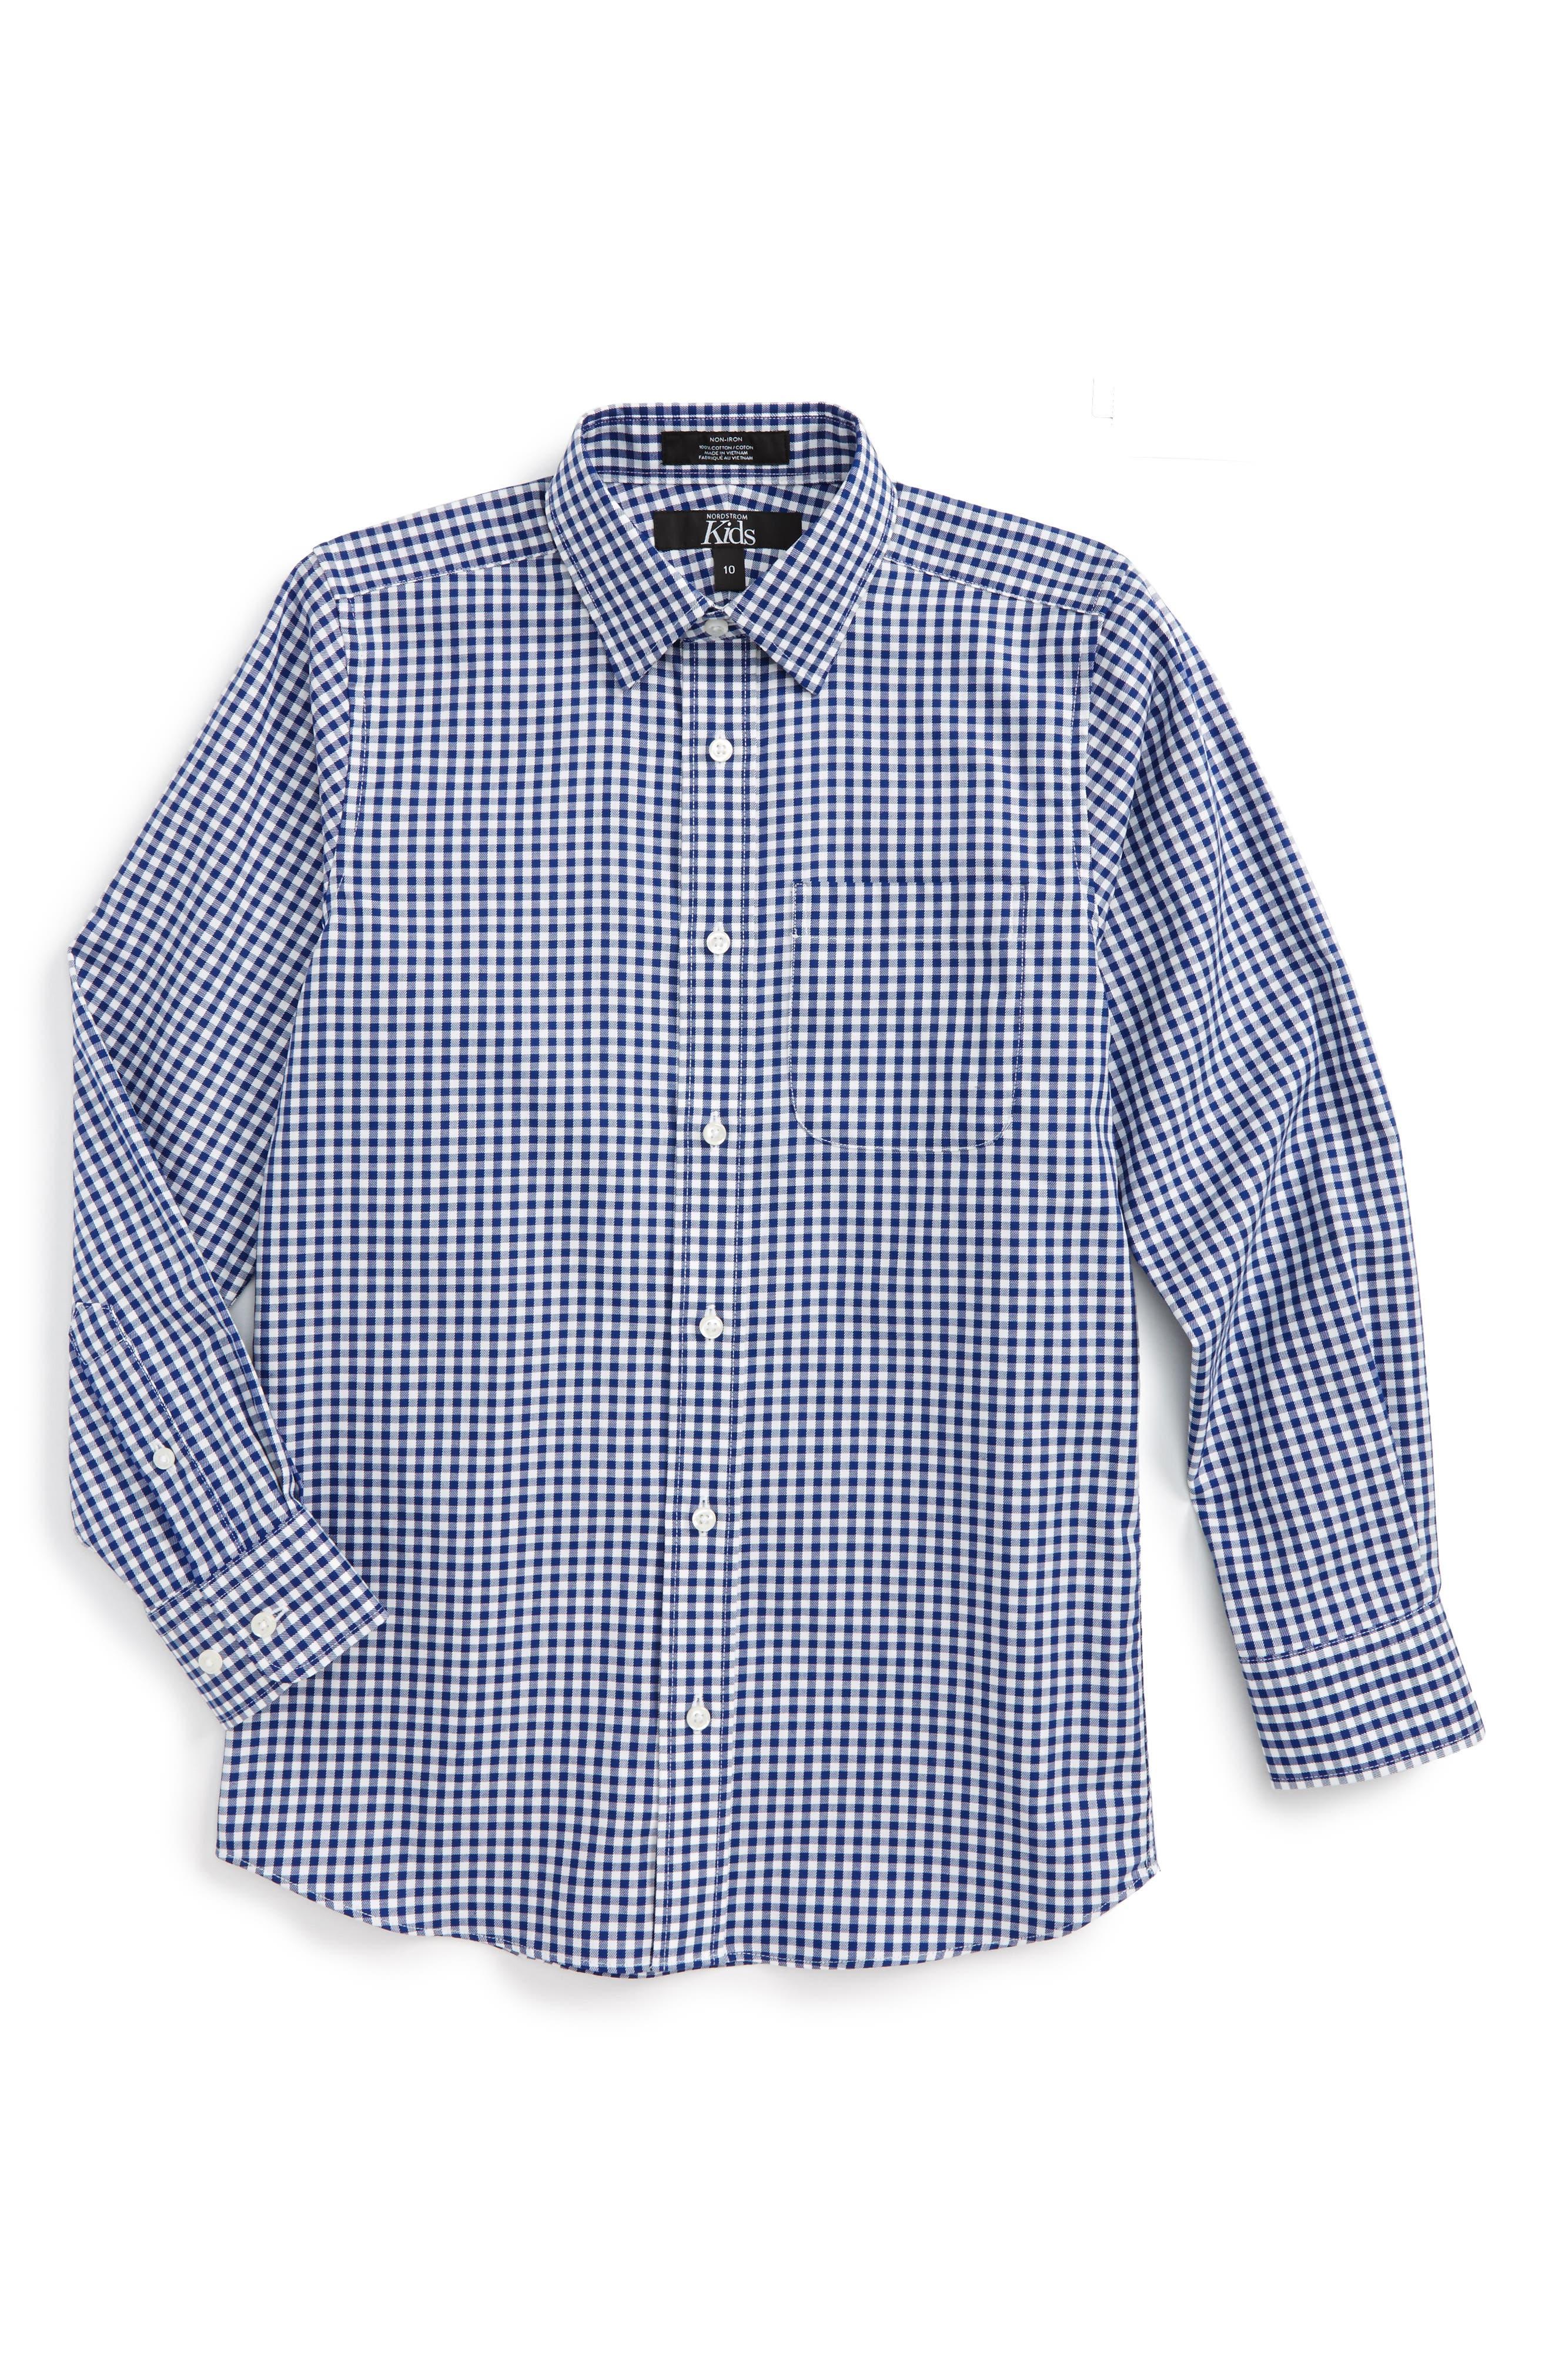 Nordstrom Non-Iron Check Dress Shirt (Big Boys)